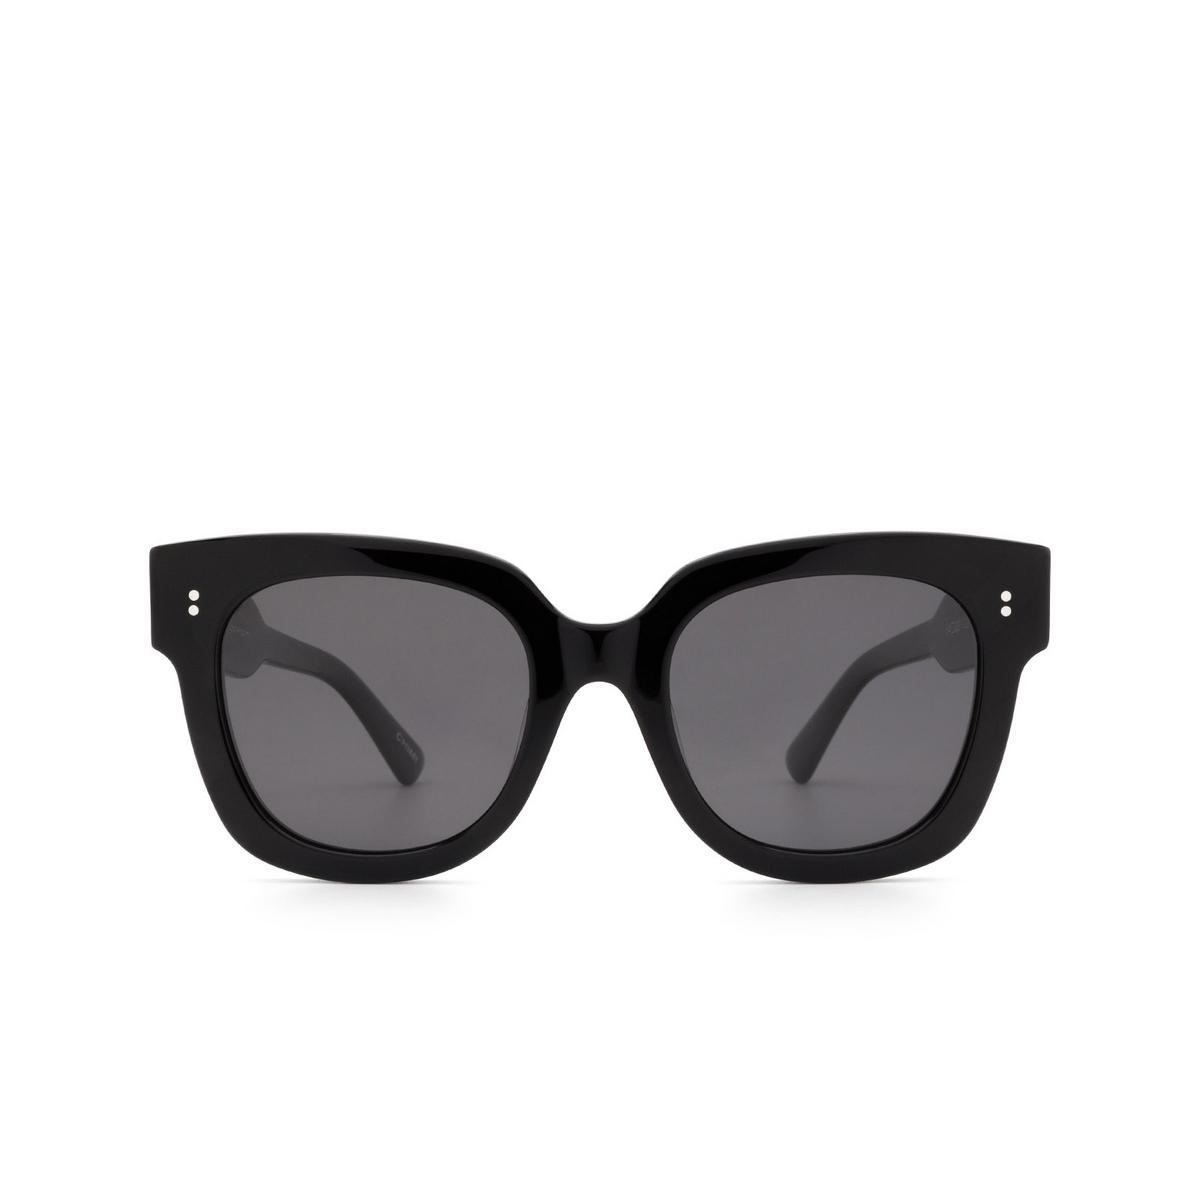 Chimi® Square Sunglasses: 08 color Black - front view.